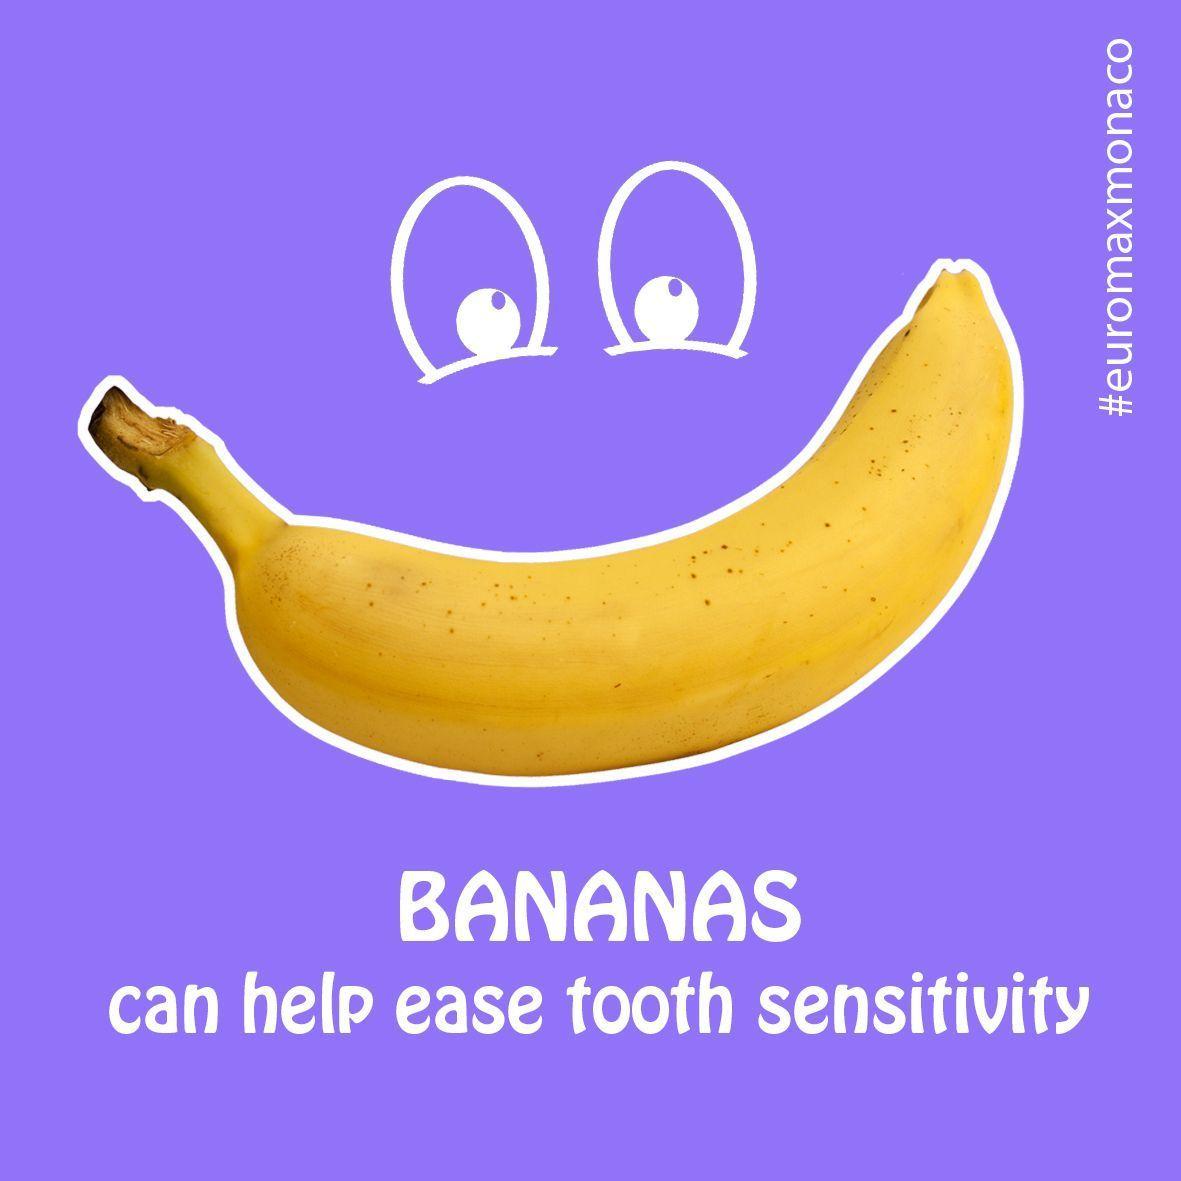 #dentalhealth #dent #dentalcad  #dentalcases  #dentalhealth #dentalhygieneschool #dentalhygienist #dentalife  #dentallife #dentalovers  #dentalphoto #dentalpractice  #dentalschool  #dentalstudent  #dentaltechnology  #dentaltips  #dentalveneers  #dentalwork #dentista #dentistas #dentistrylife  #dentistrylove  #estheticdentistry #dentistrymyworld #dentistrysociety  #dentistrystudent  #euromax_monaco #operasystem #intraoralscanner #dentalfacts #dentalhealth #dent #dentalcad  #dentalcases  #dentalhe #dentalfacts